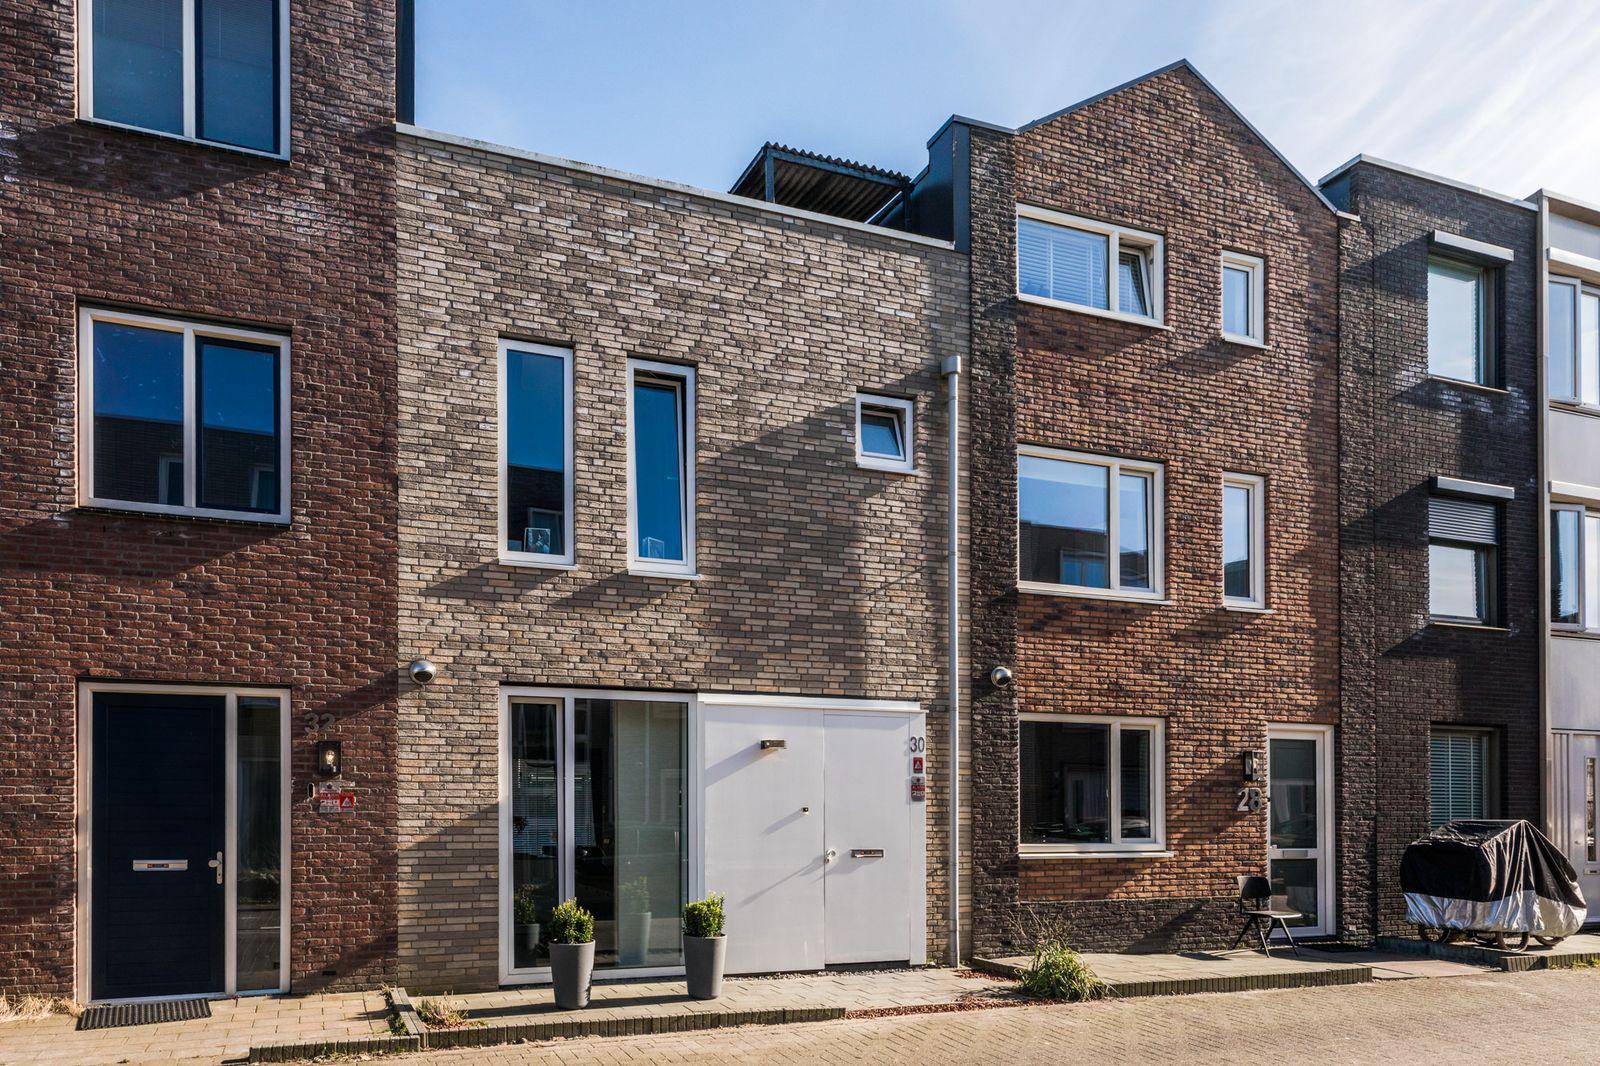 Mazustraat 30, Almere